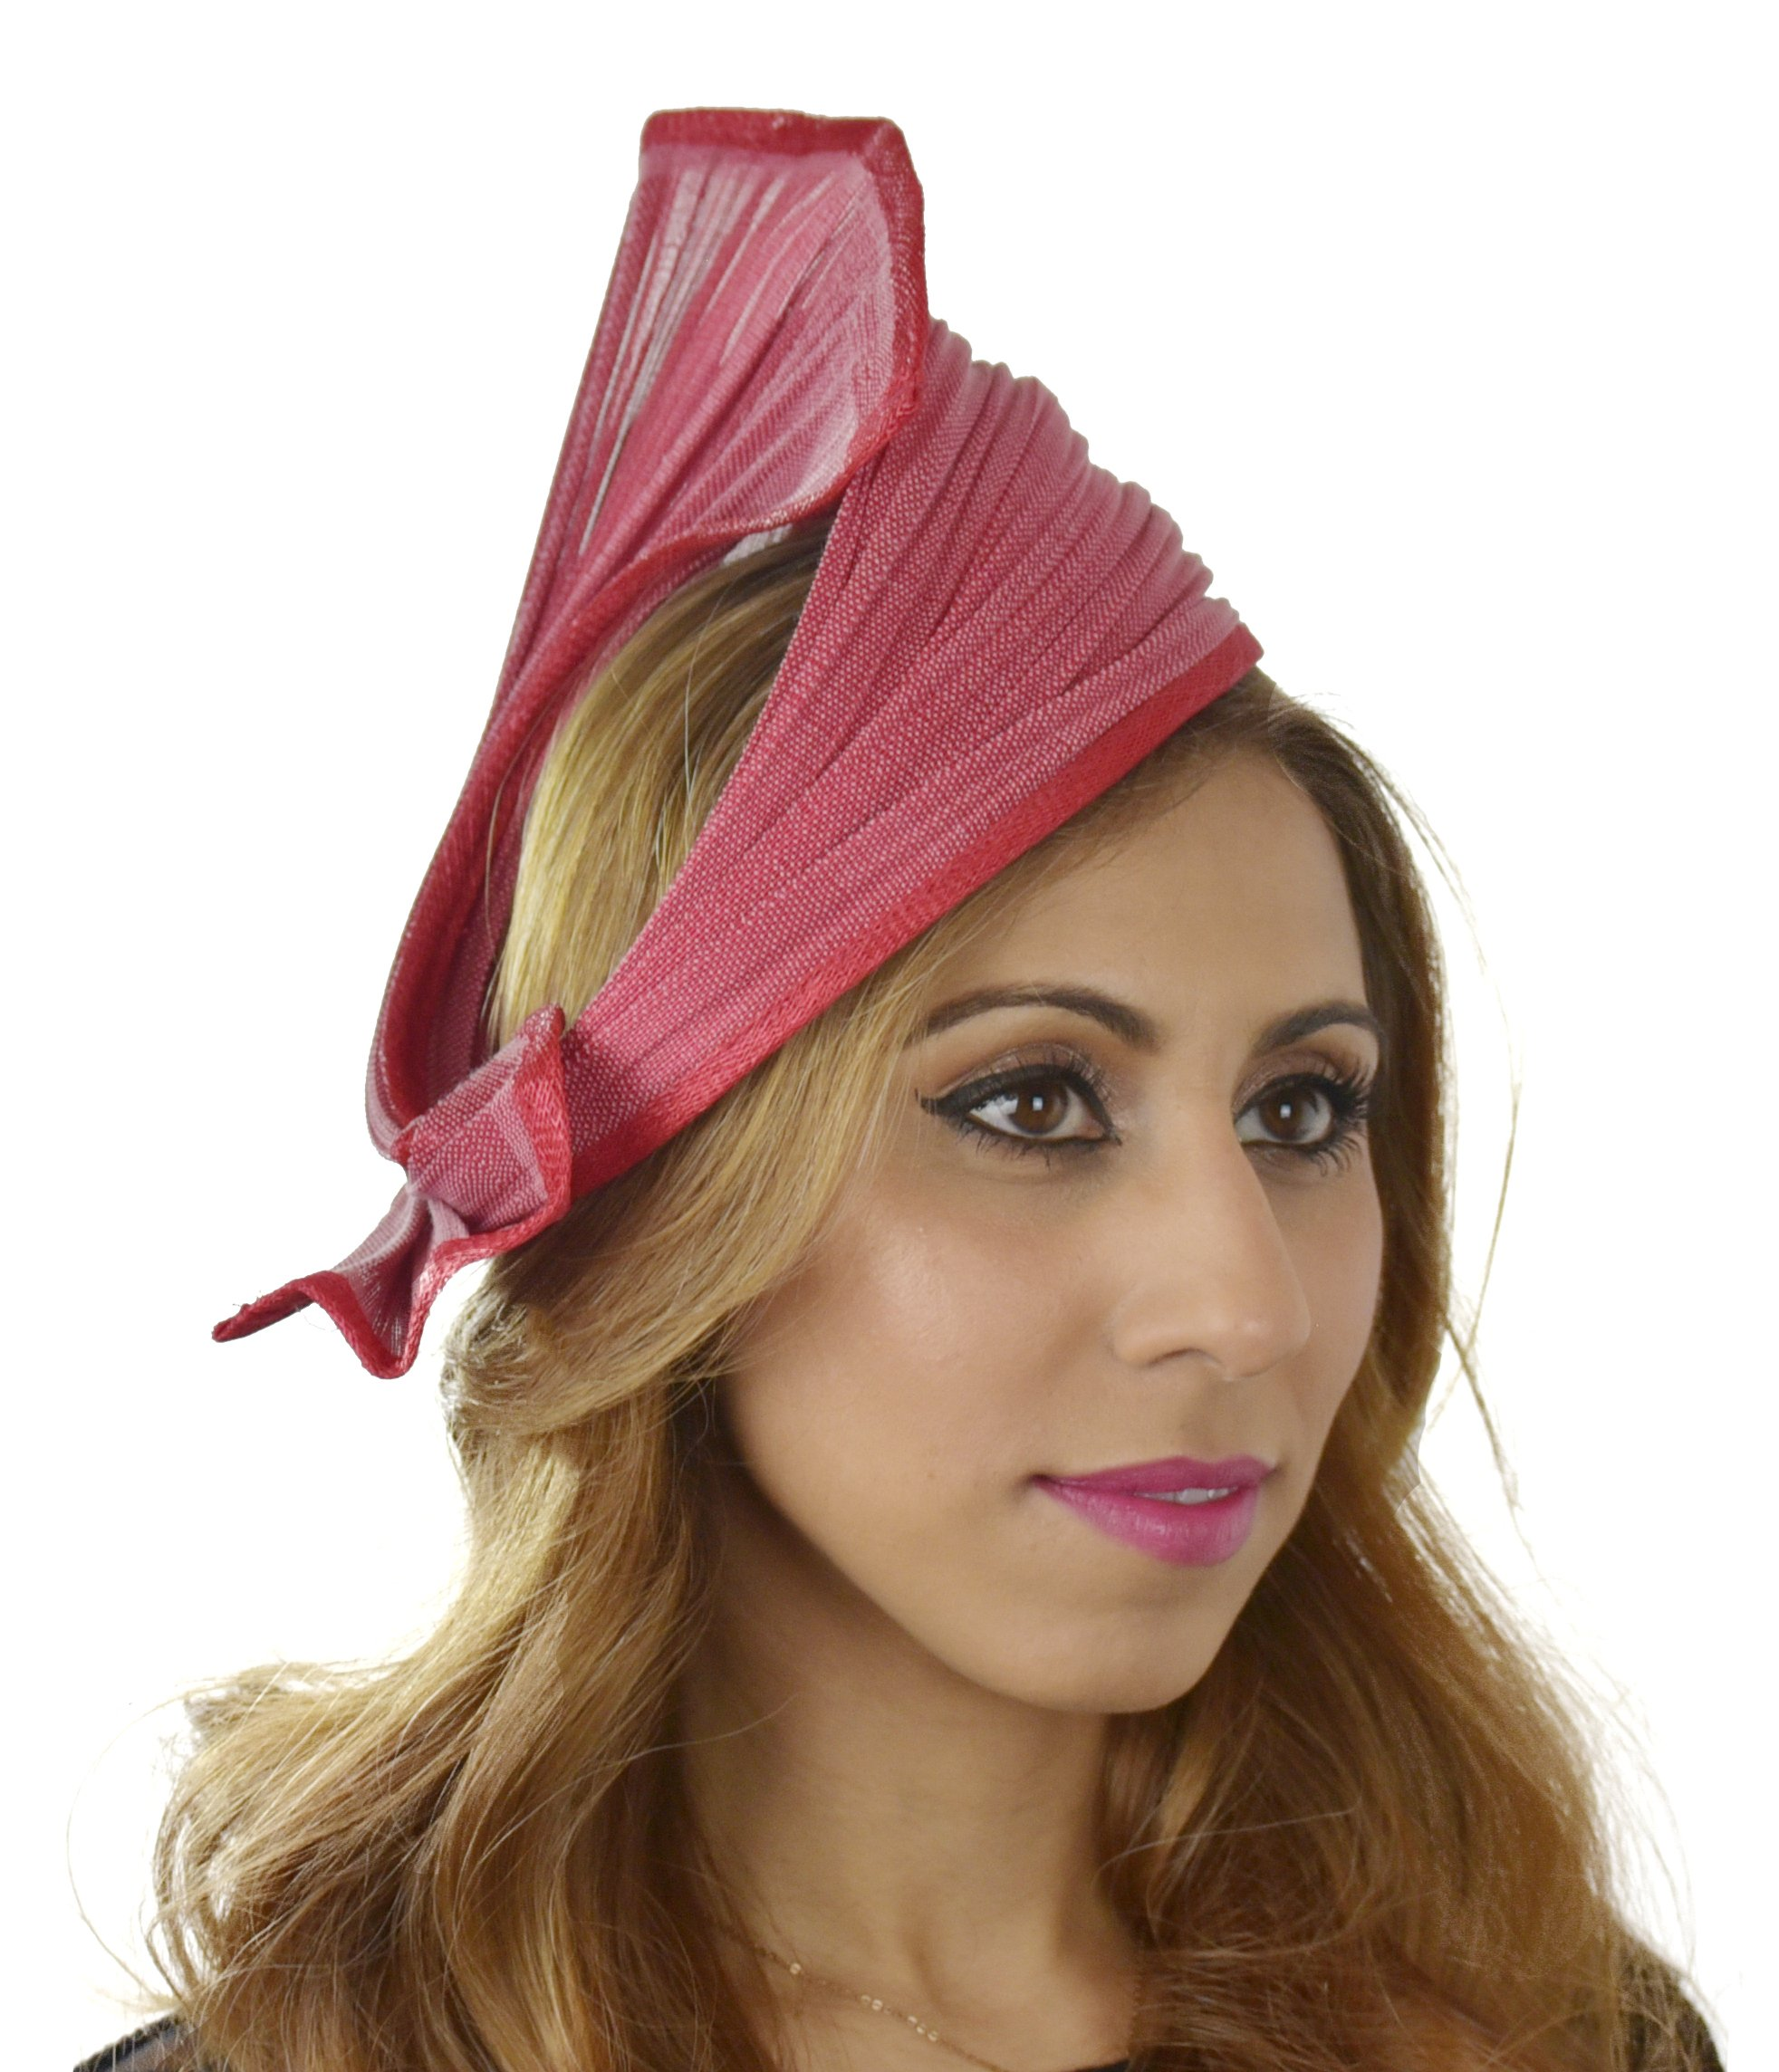 Hats By Cressida Ladies Wedding Races Ascot Derby Fascinator Headband Red